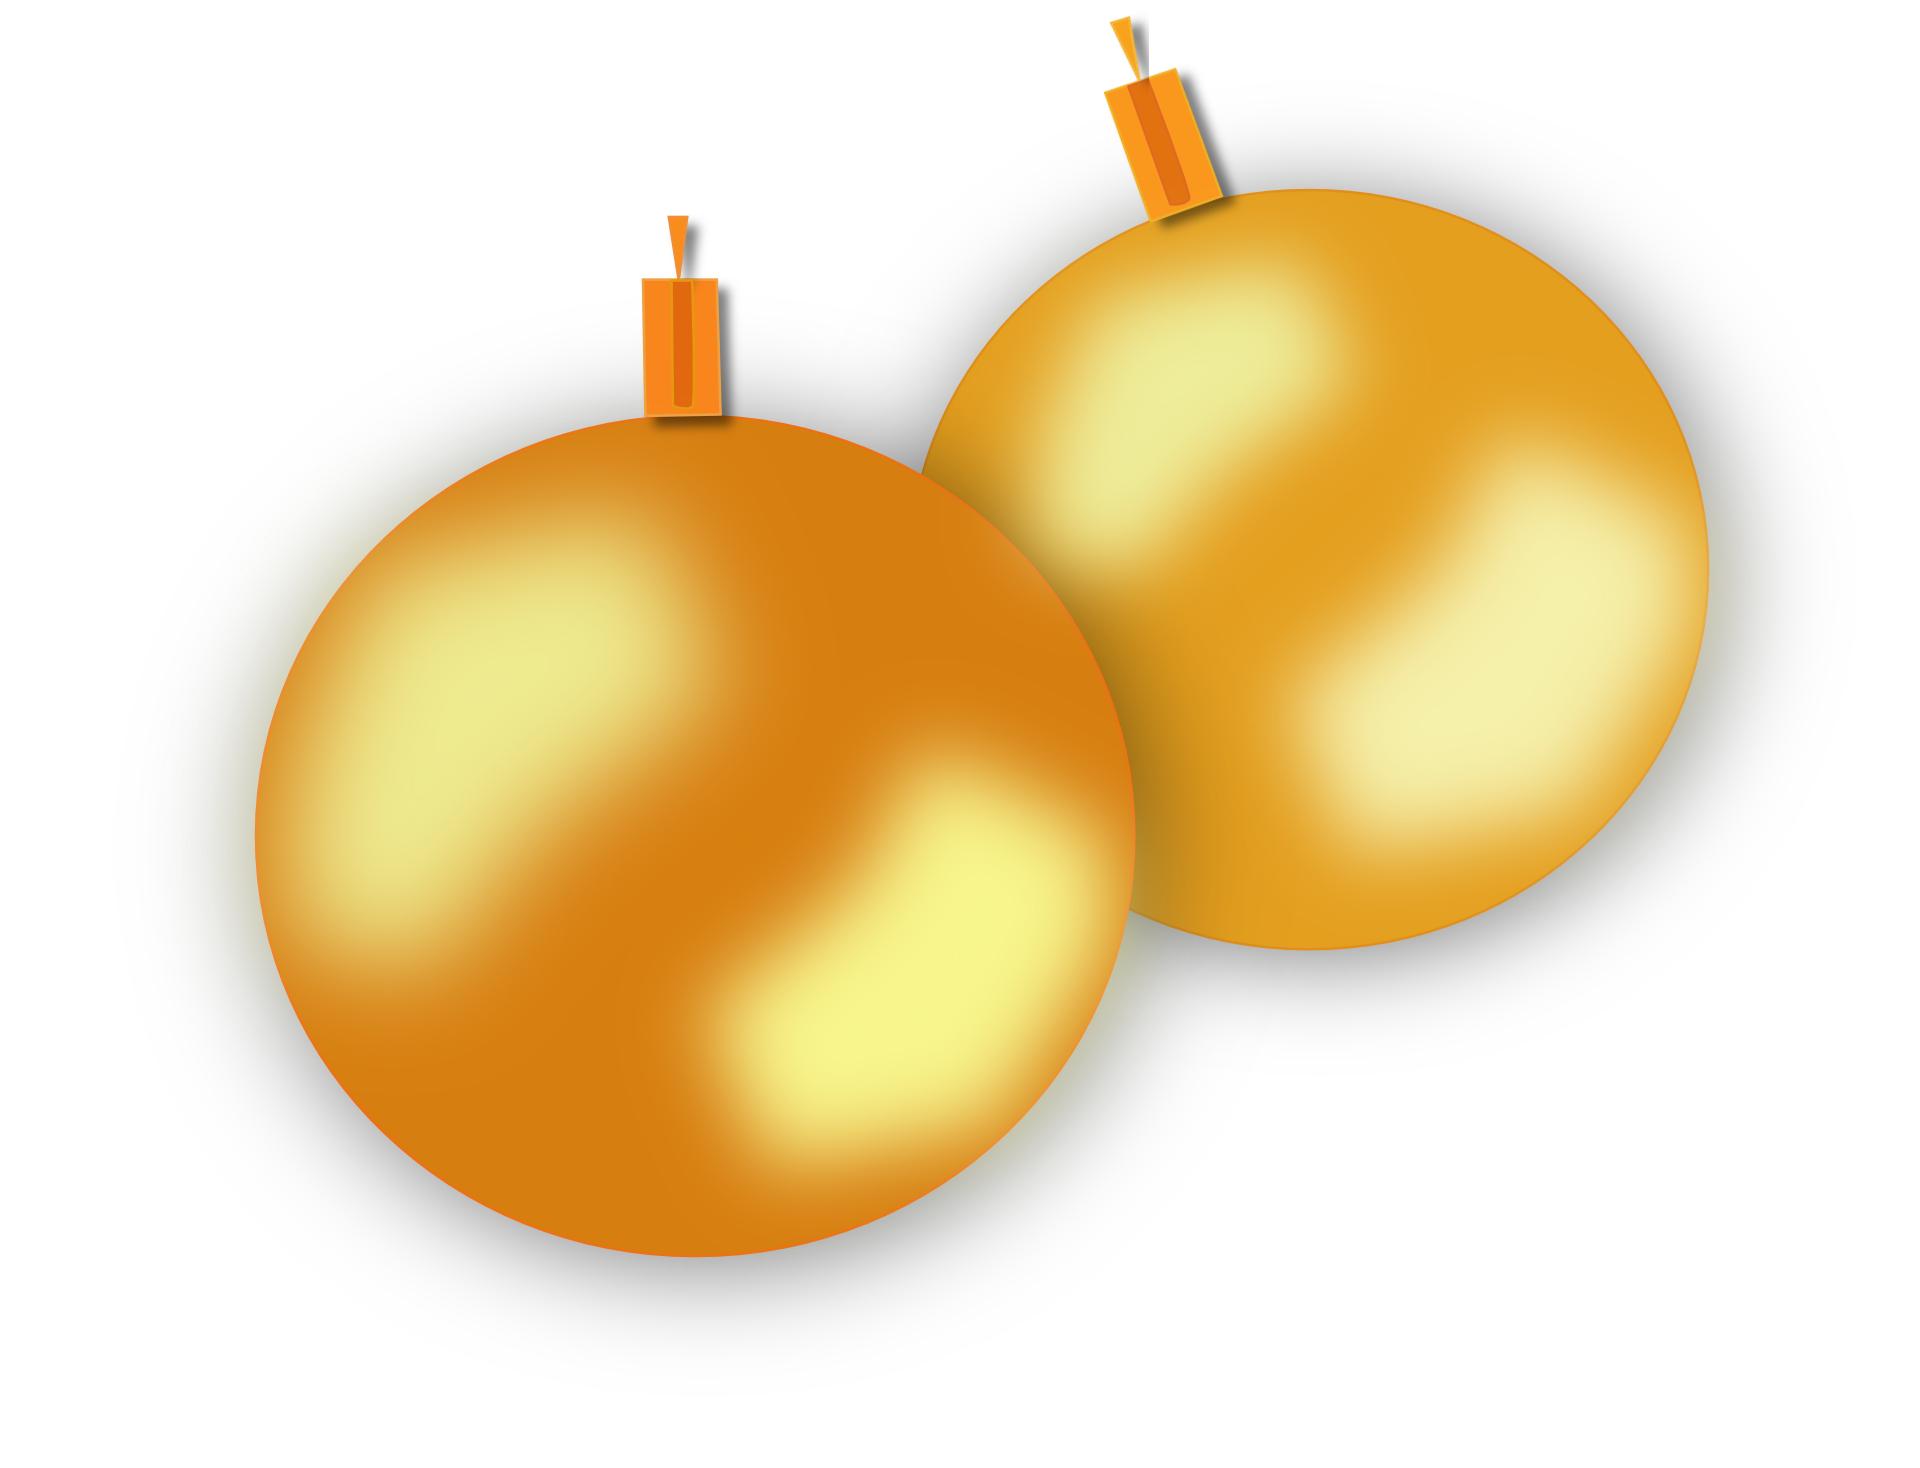 gold christmas balls-ornaments- ball vector